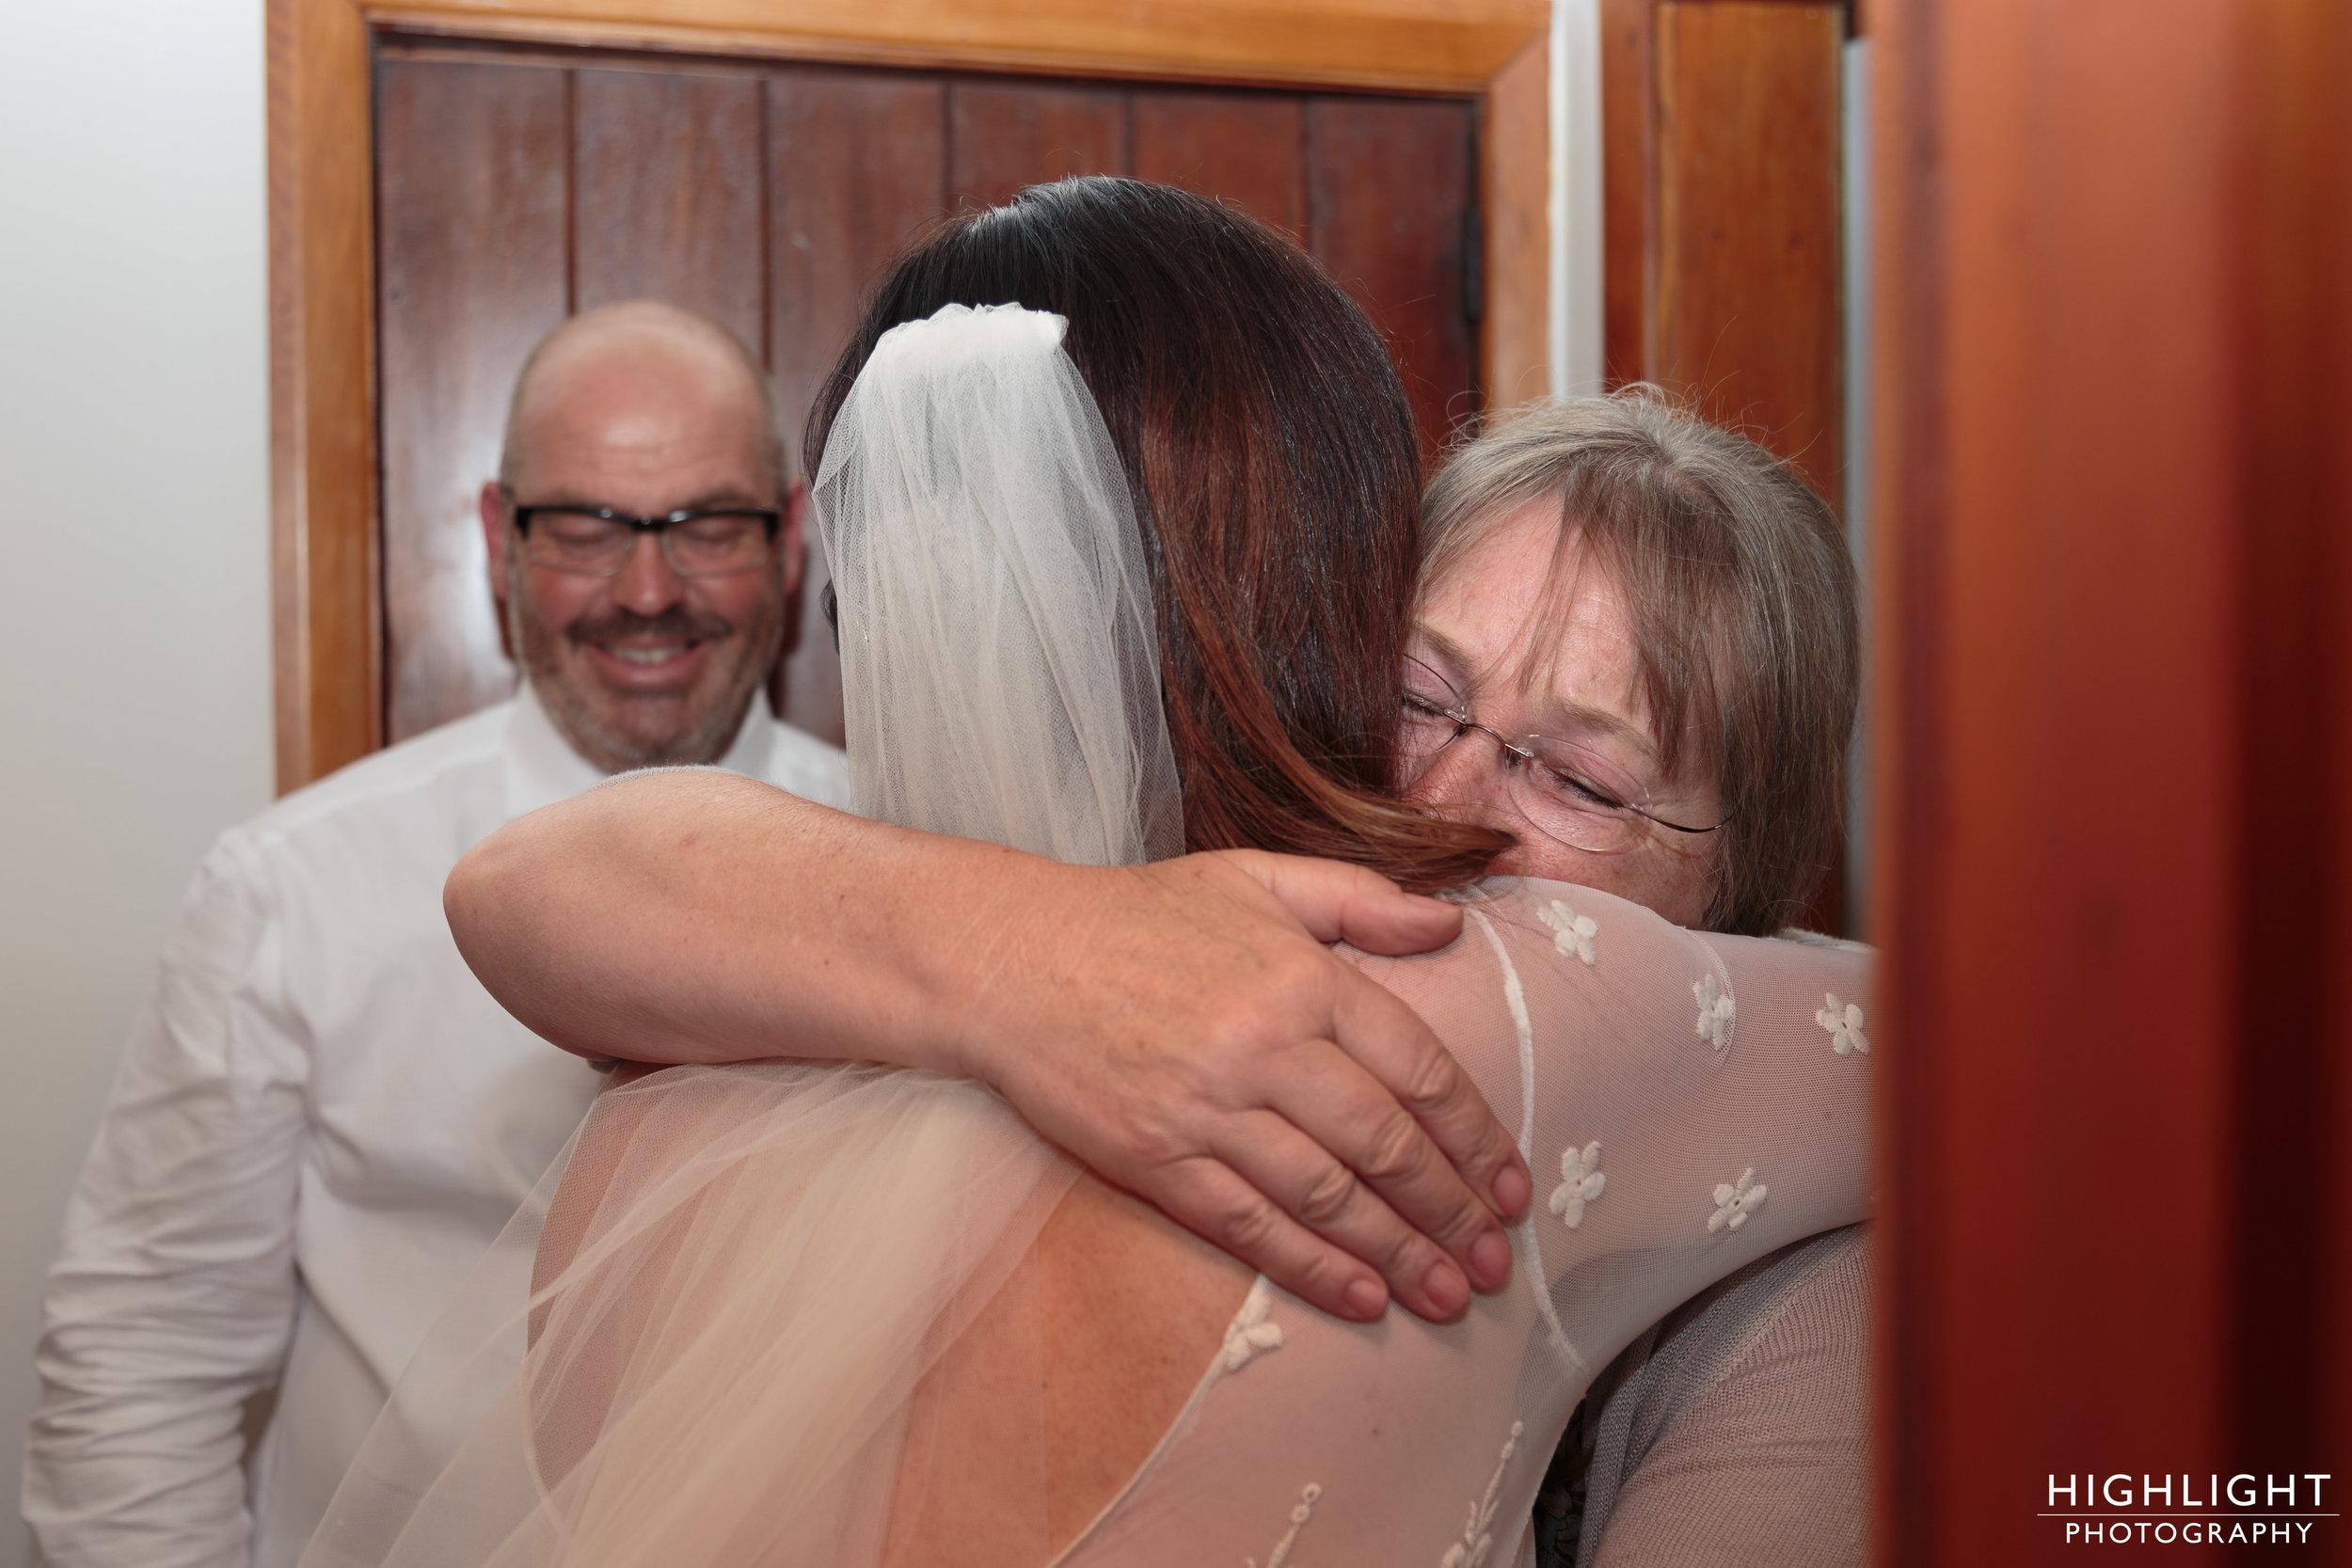 highlight-wedding-photography-new-zealand-makoura-lodge-wedding-34.jpg